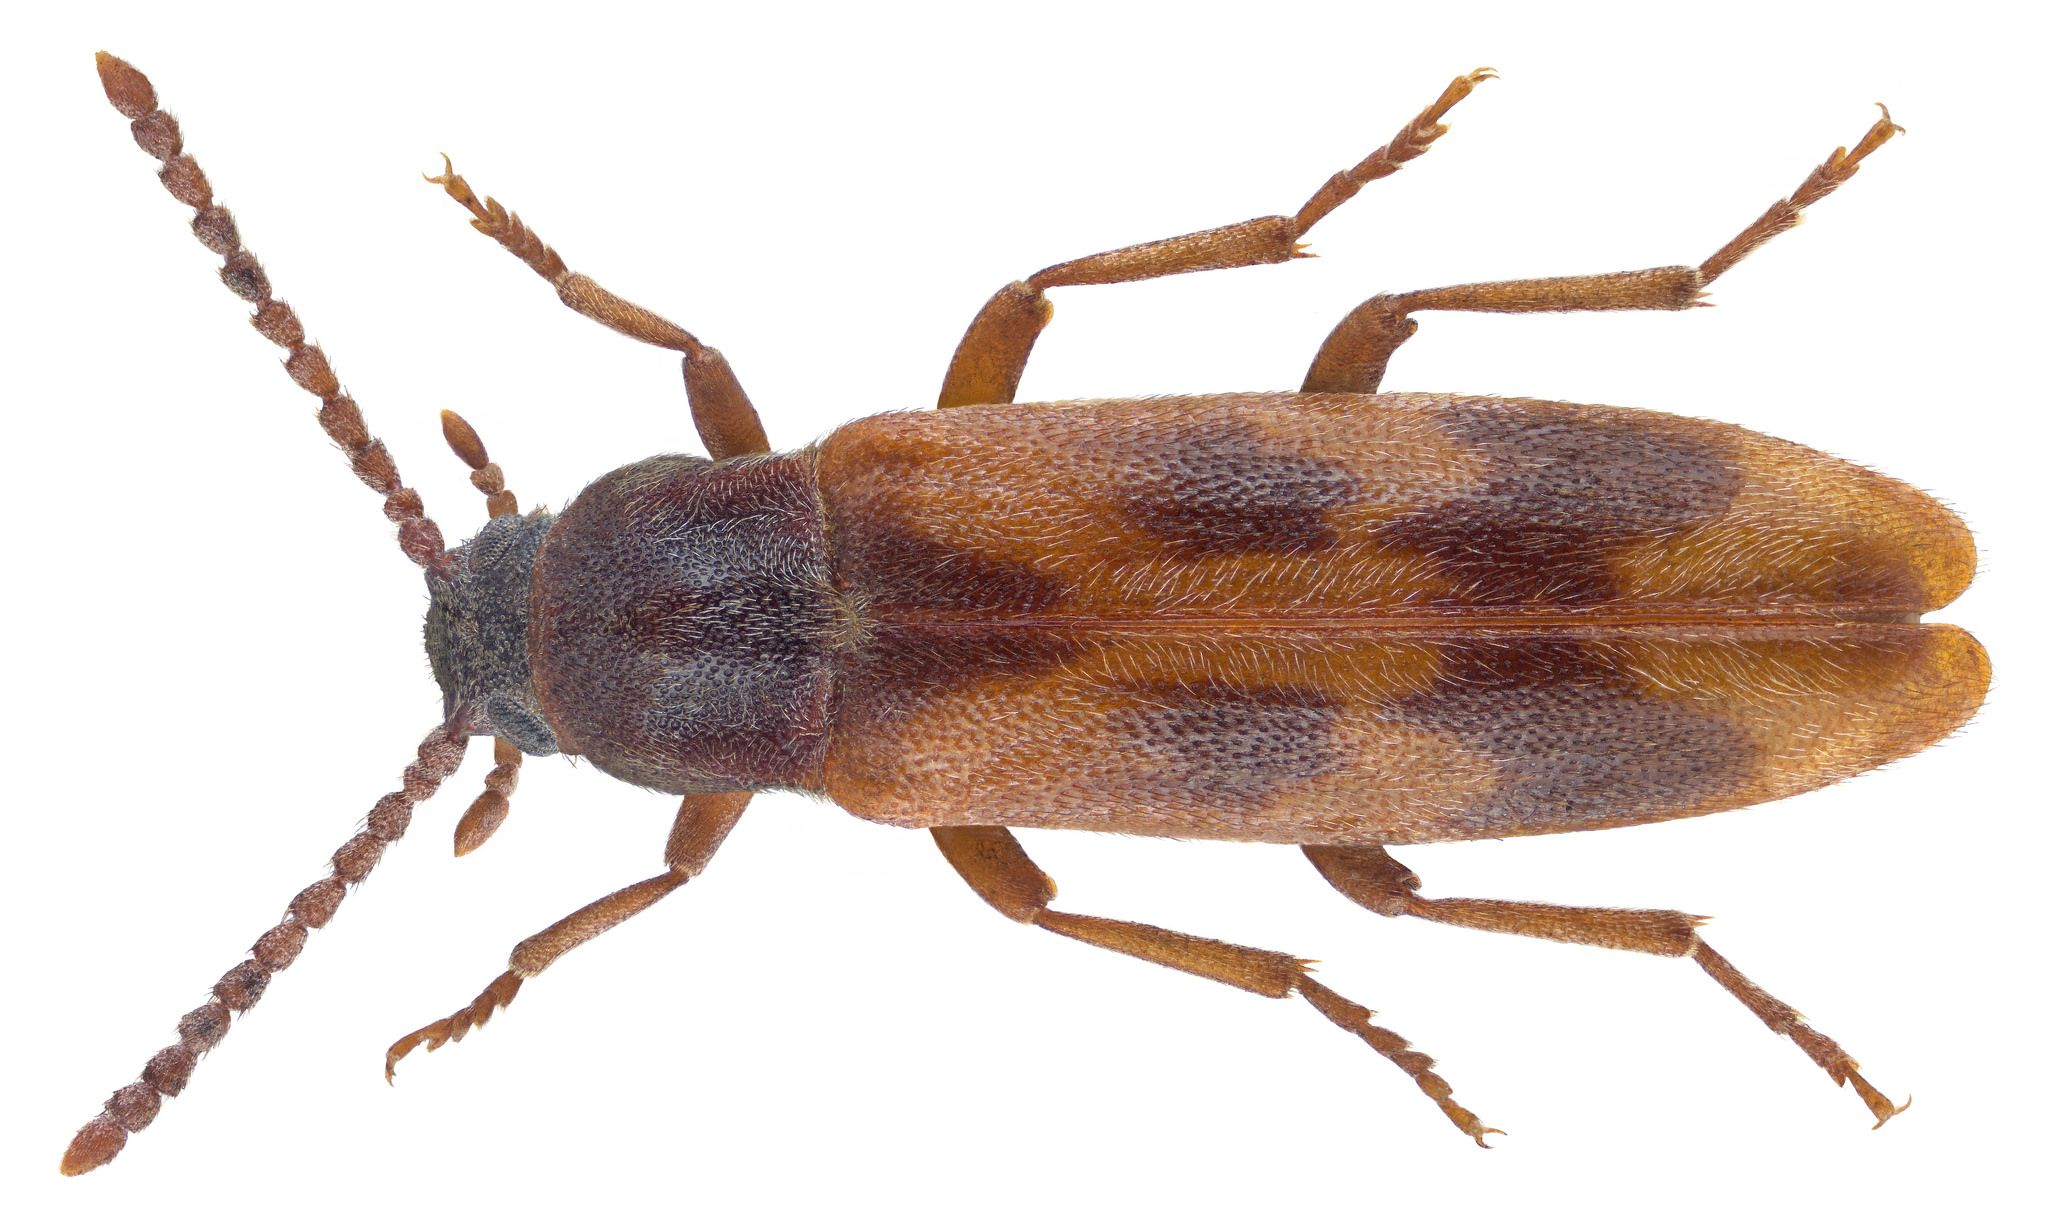 Hipulus Quercinus Quensel 1790 画像あり 甲虫類